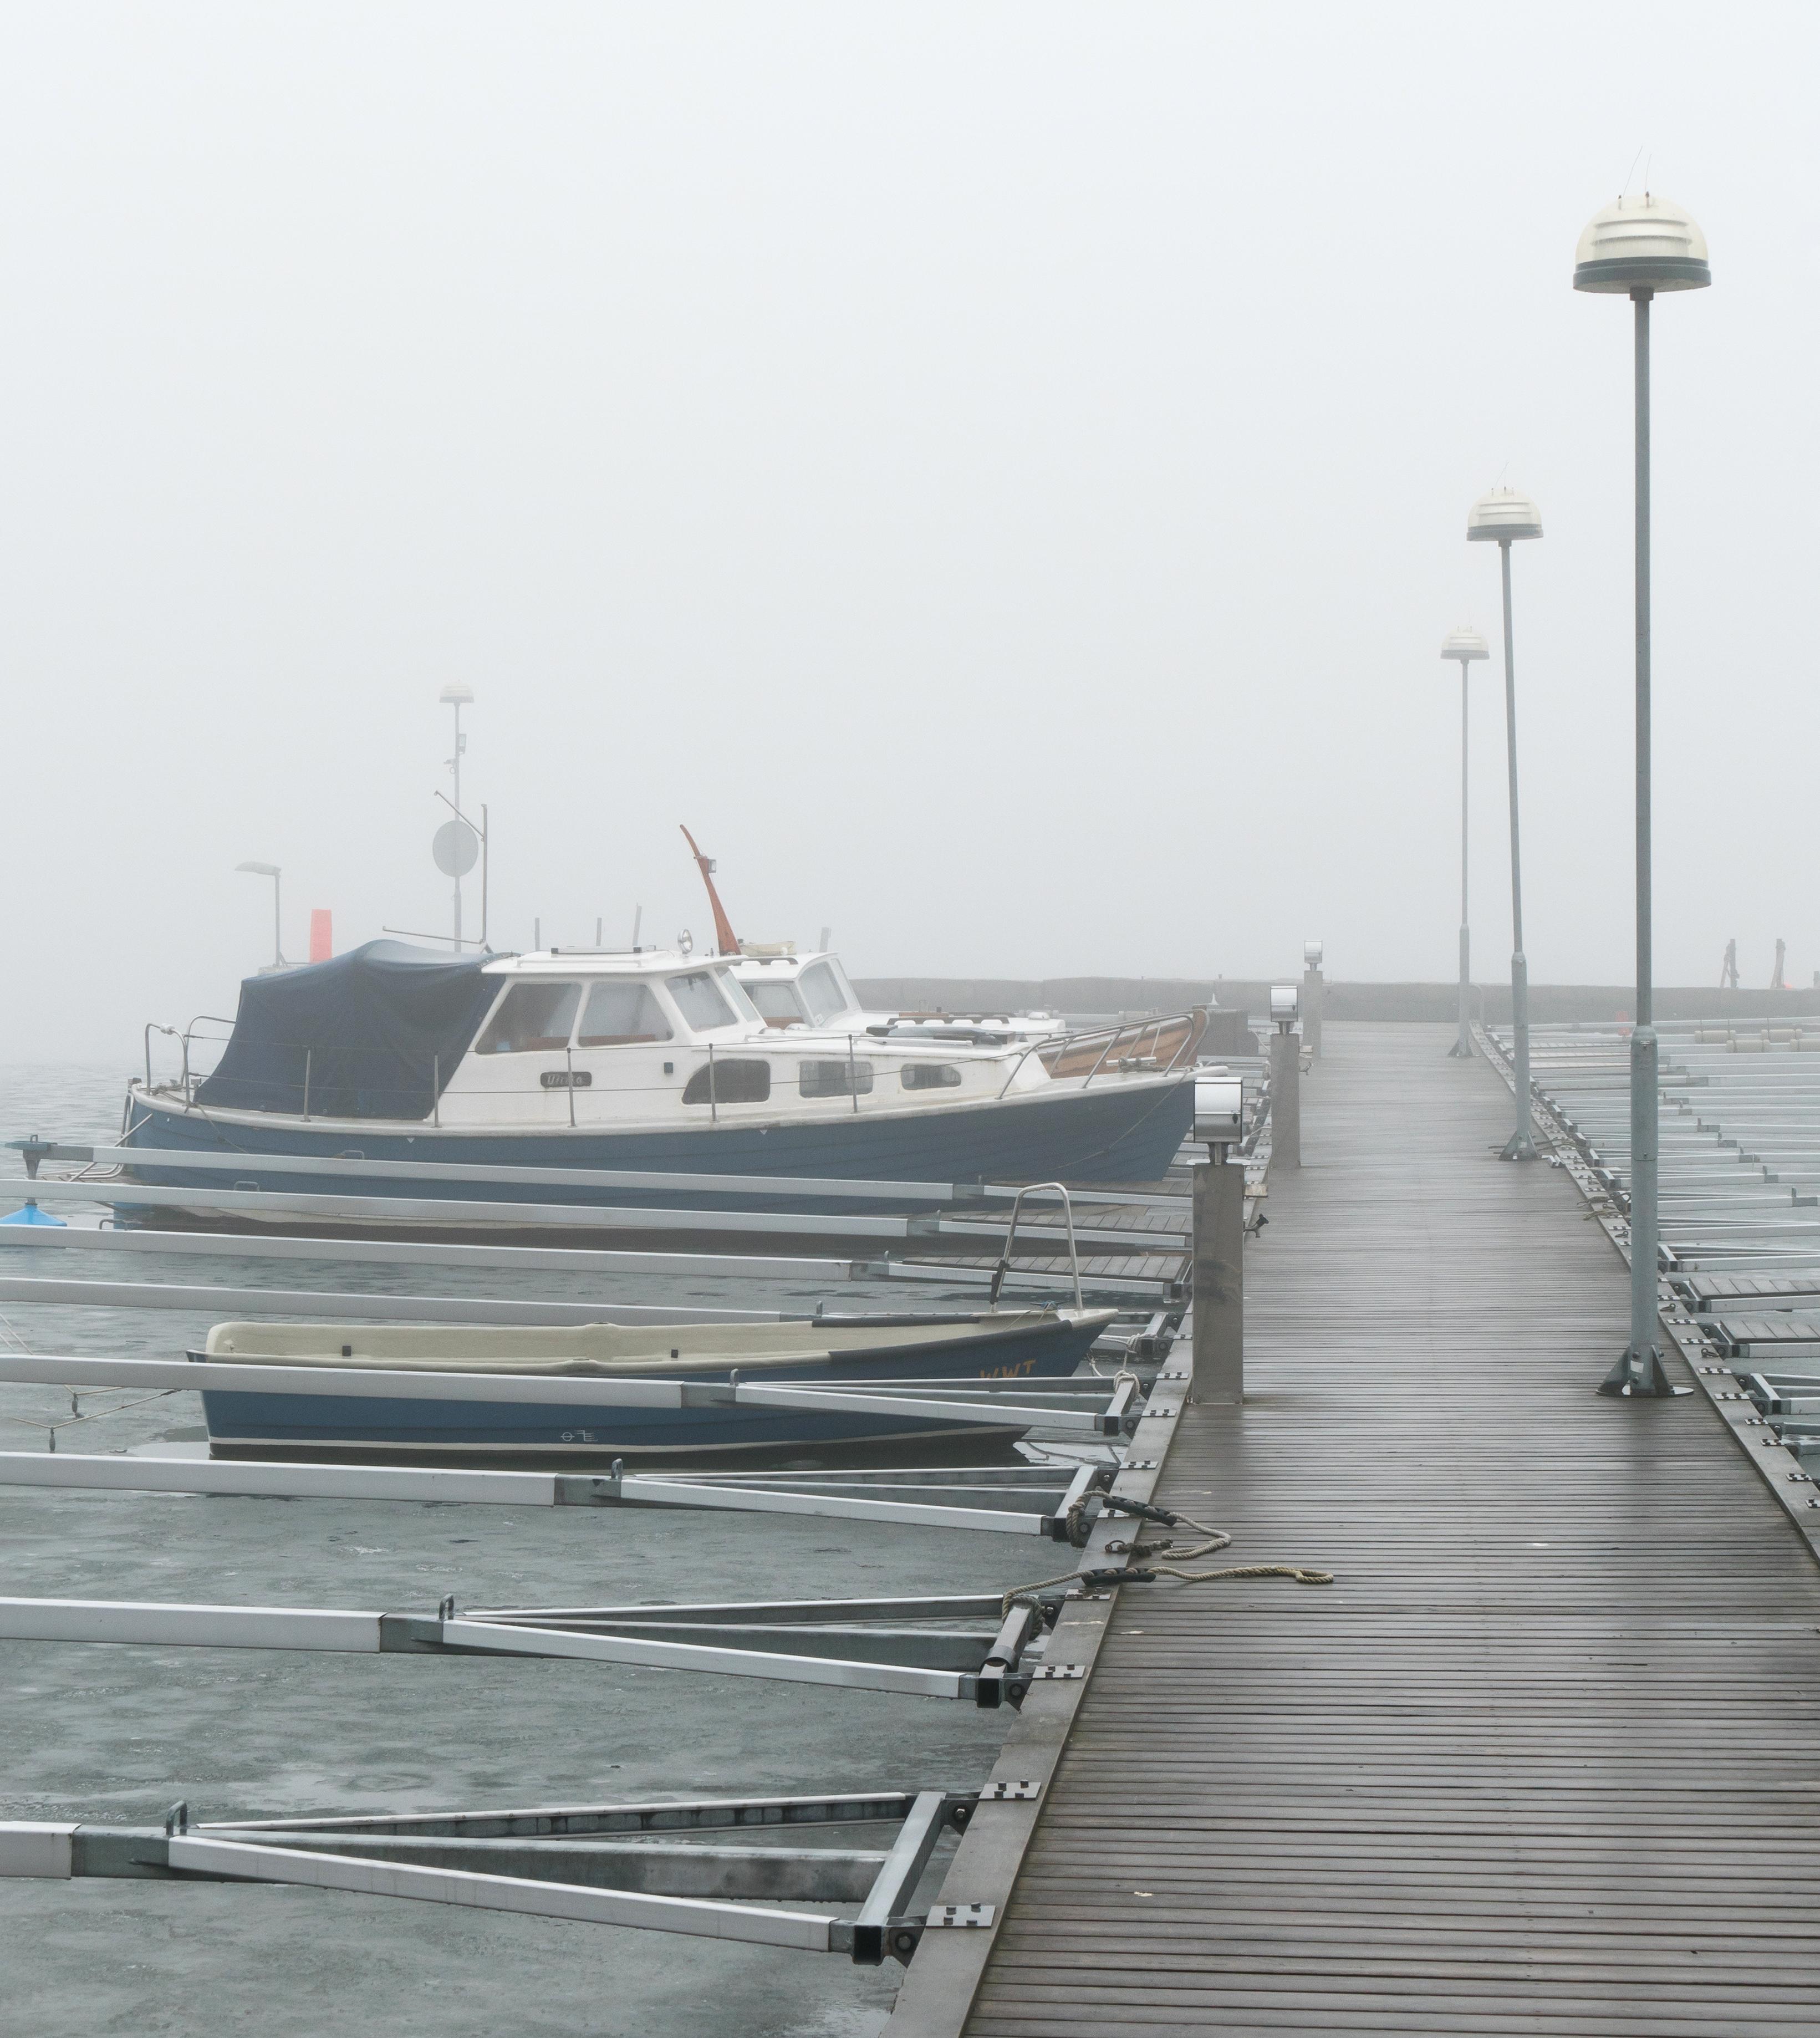 Fog and ice at Rixö boat club 5, Boat, Boat_club, Dock_fingers, Fog, HQ Photo